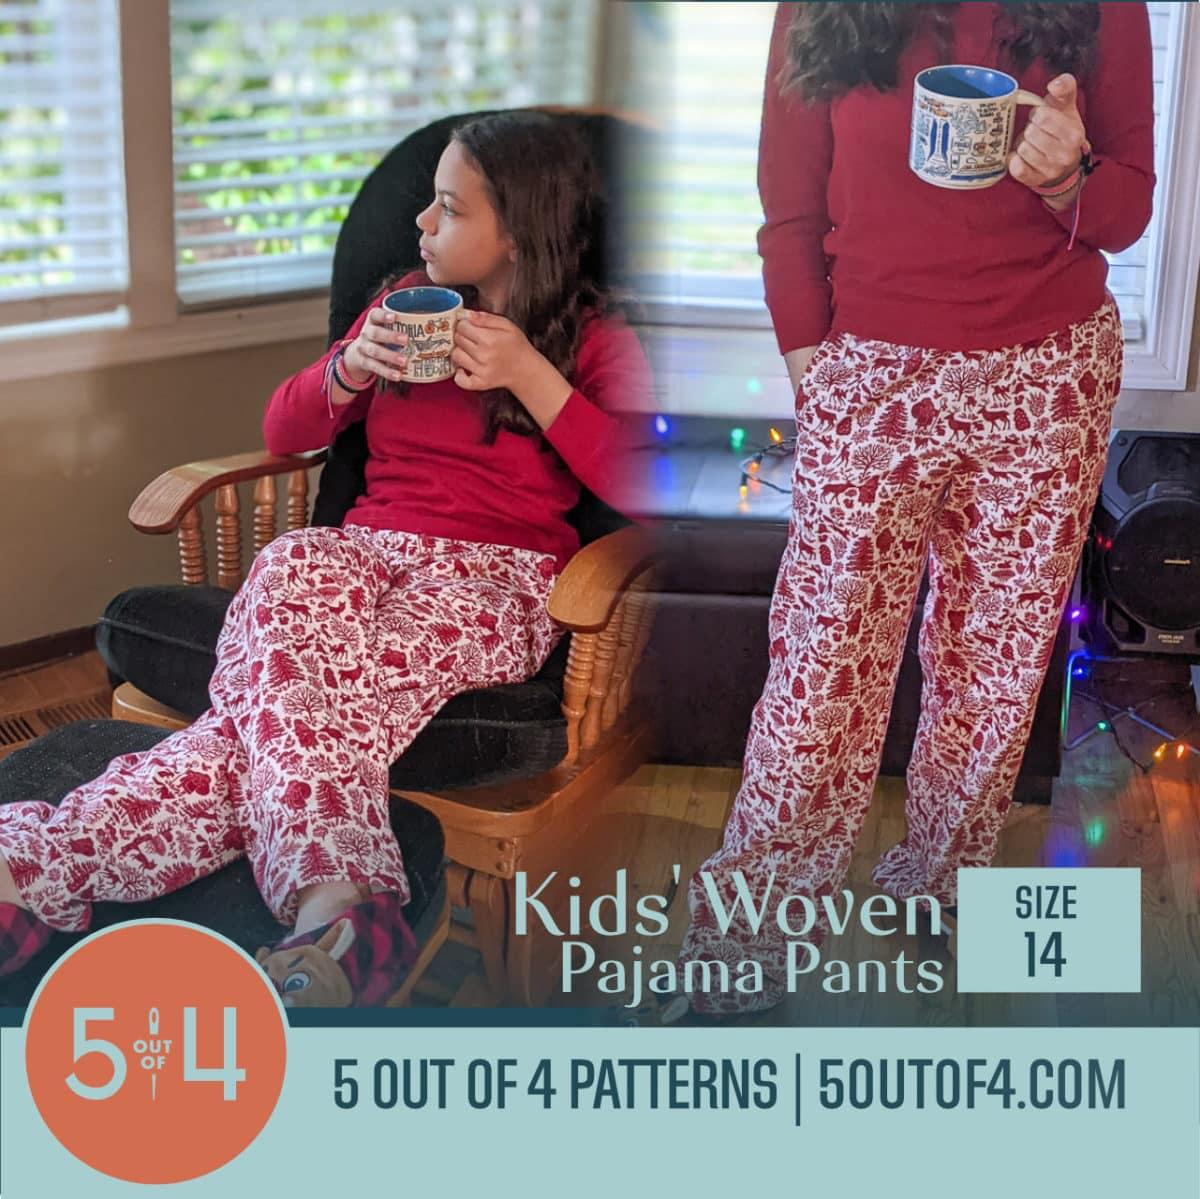 Kids' Woven Pajama pants size 14